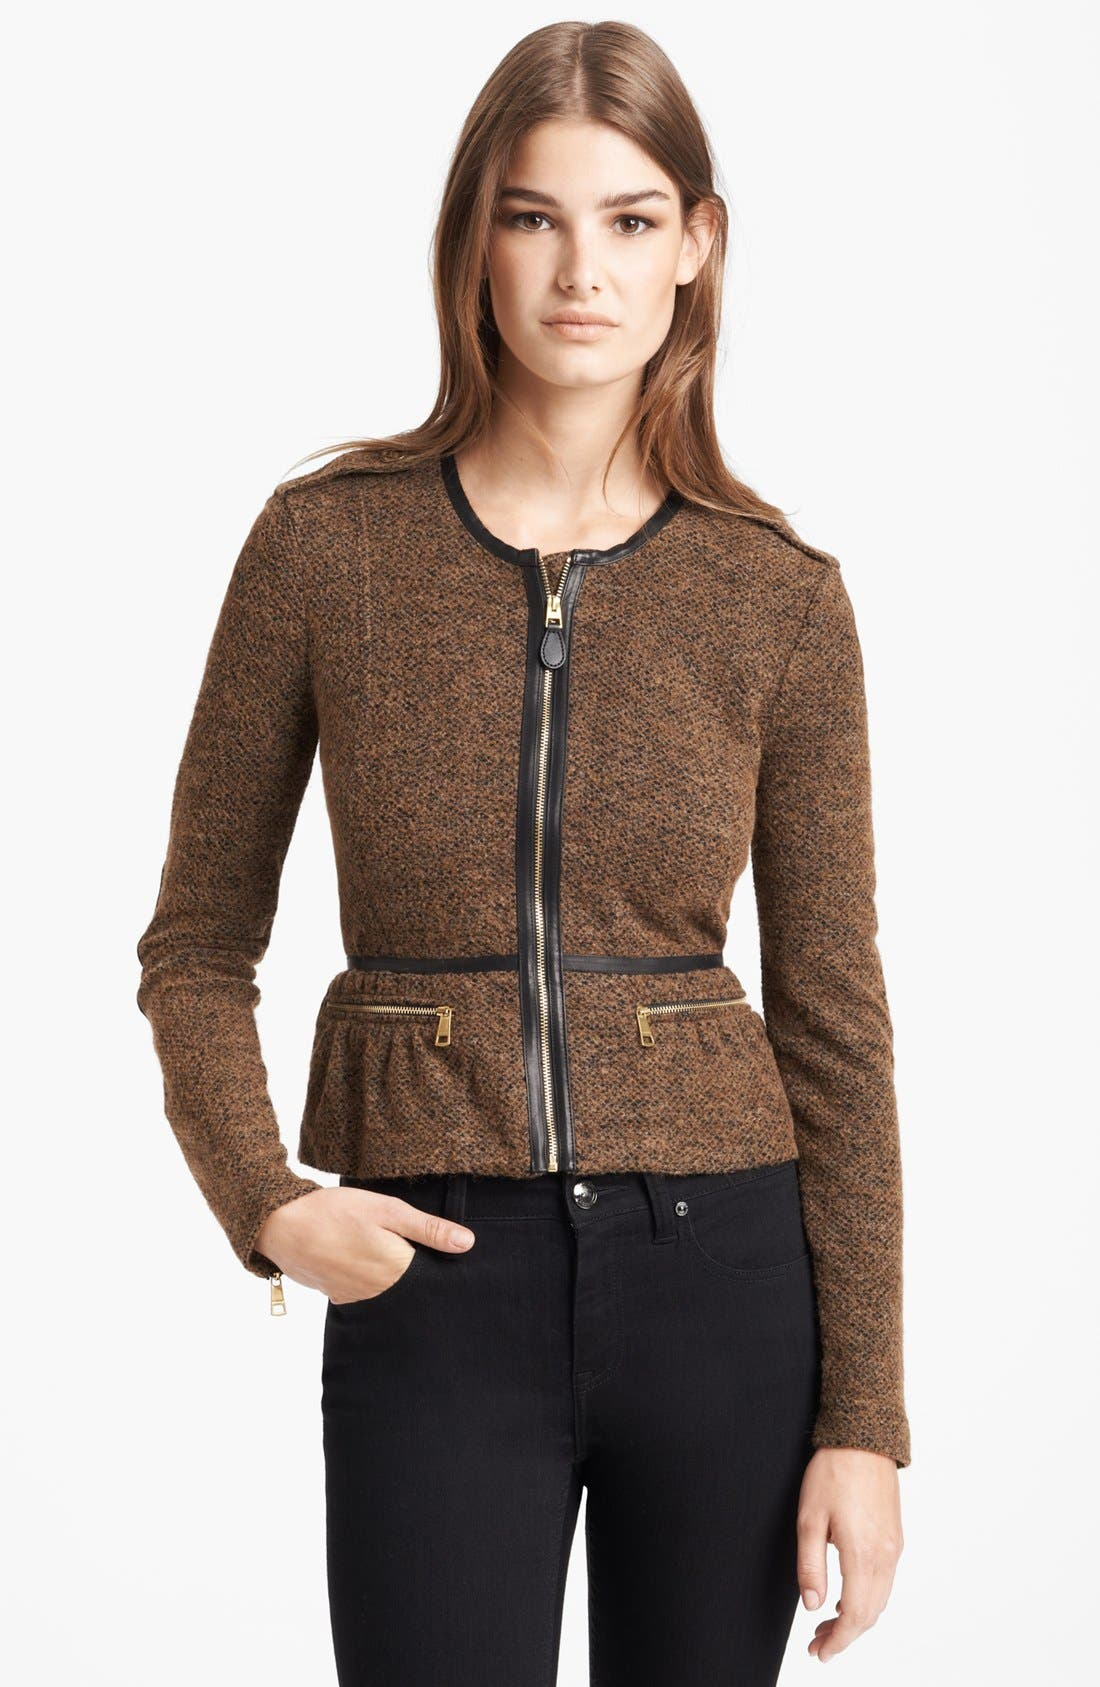 Alternate Image 1 Selected - Burberry Brit 'Meriden' Leather Trim Peplum Jacket